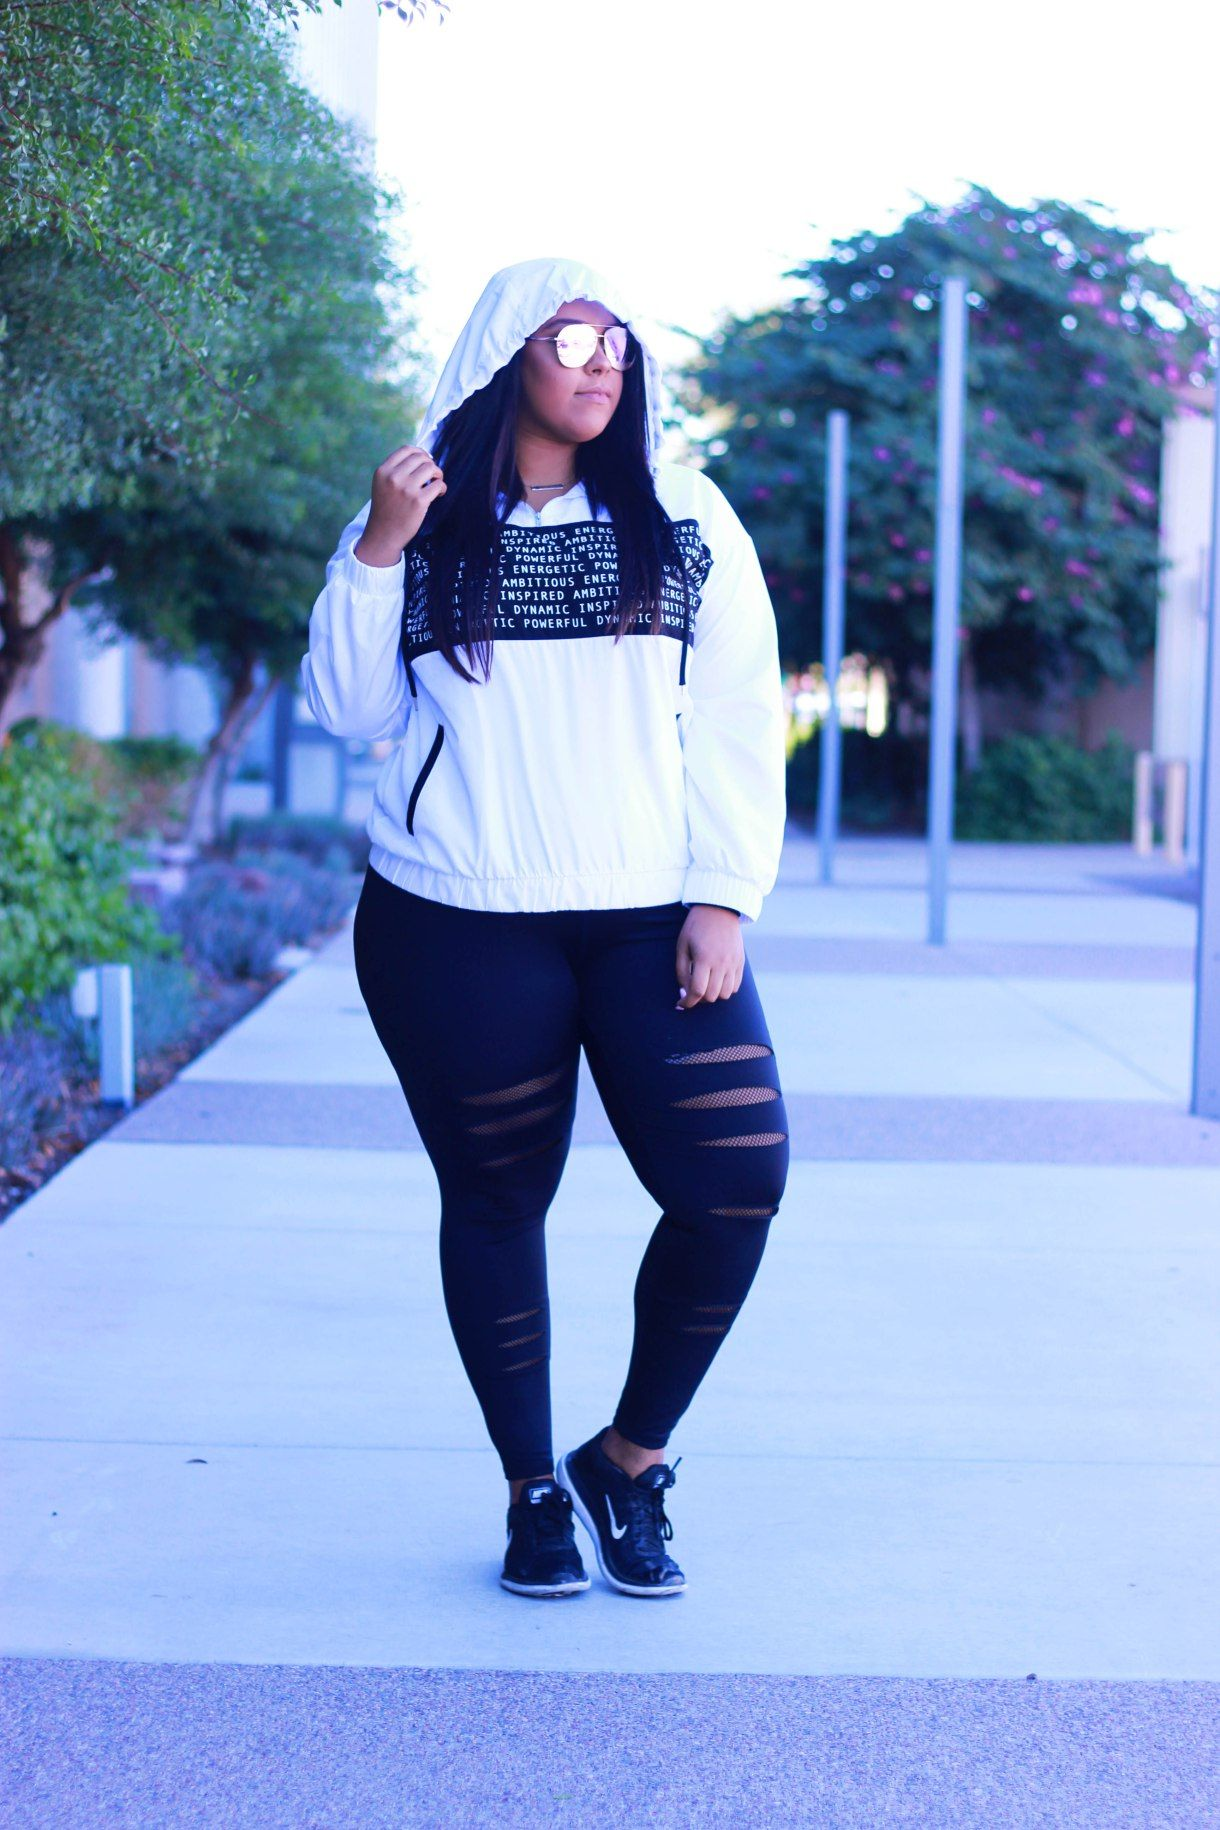 0bddbd46496 Plus Size Activewear - Plus Size Fashion for Women